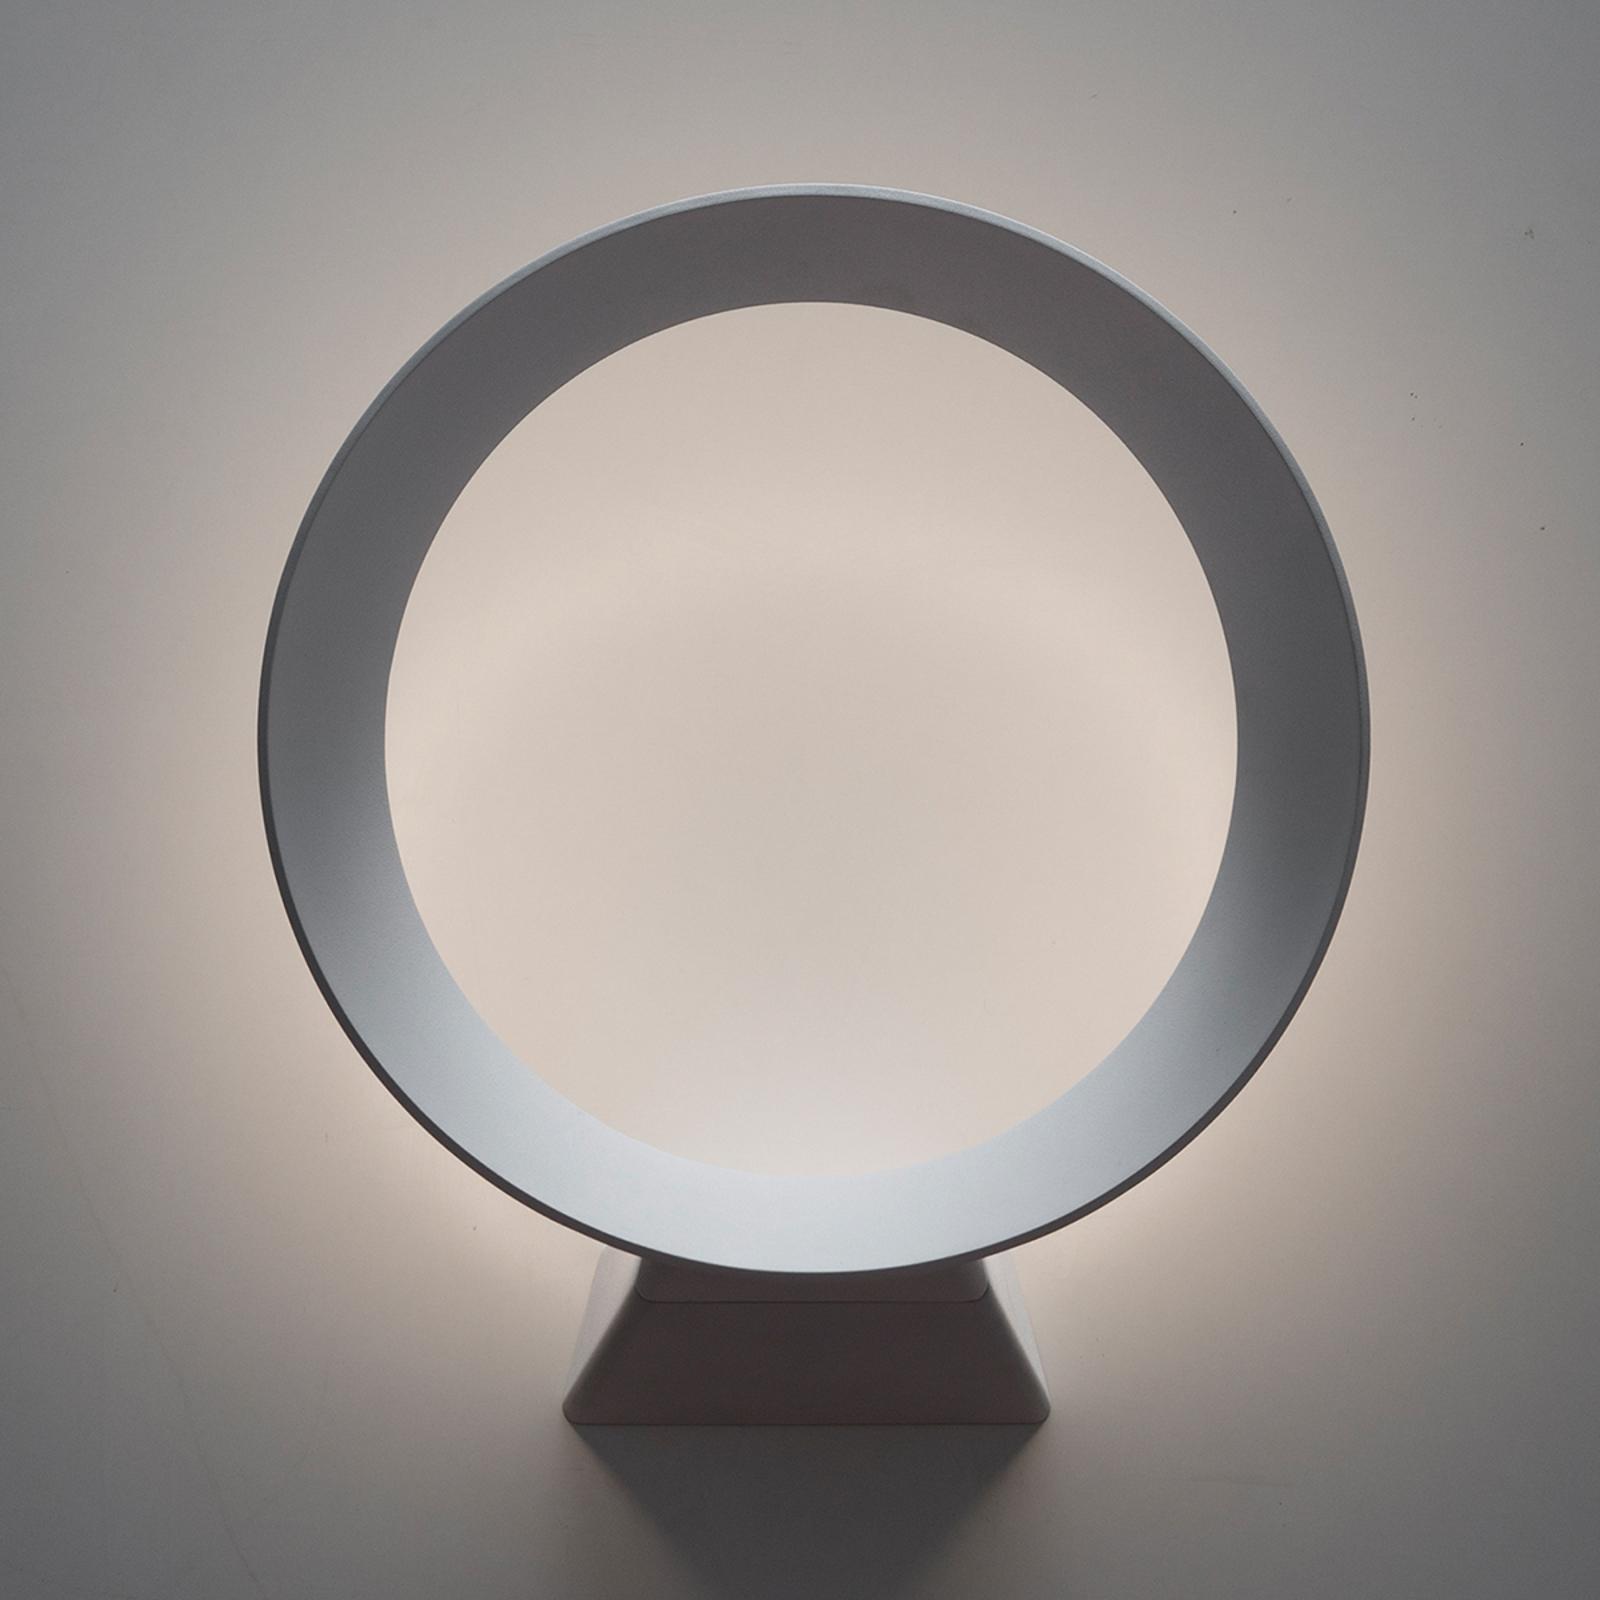 Martinelli Luce LED+O-seinävalaisin 21,6 W 2 700 K